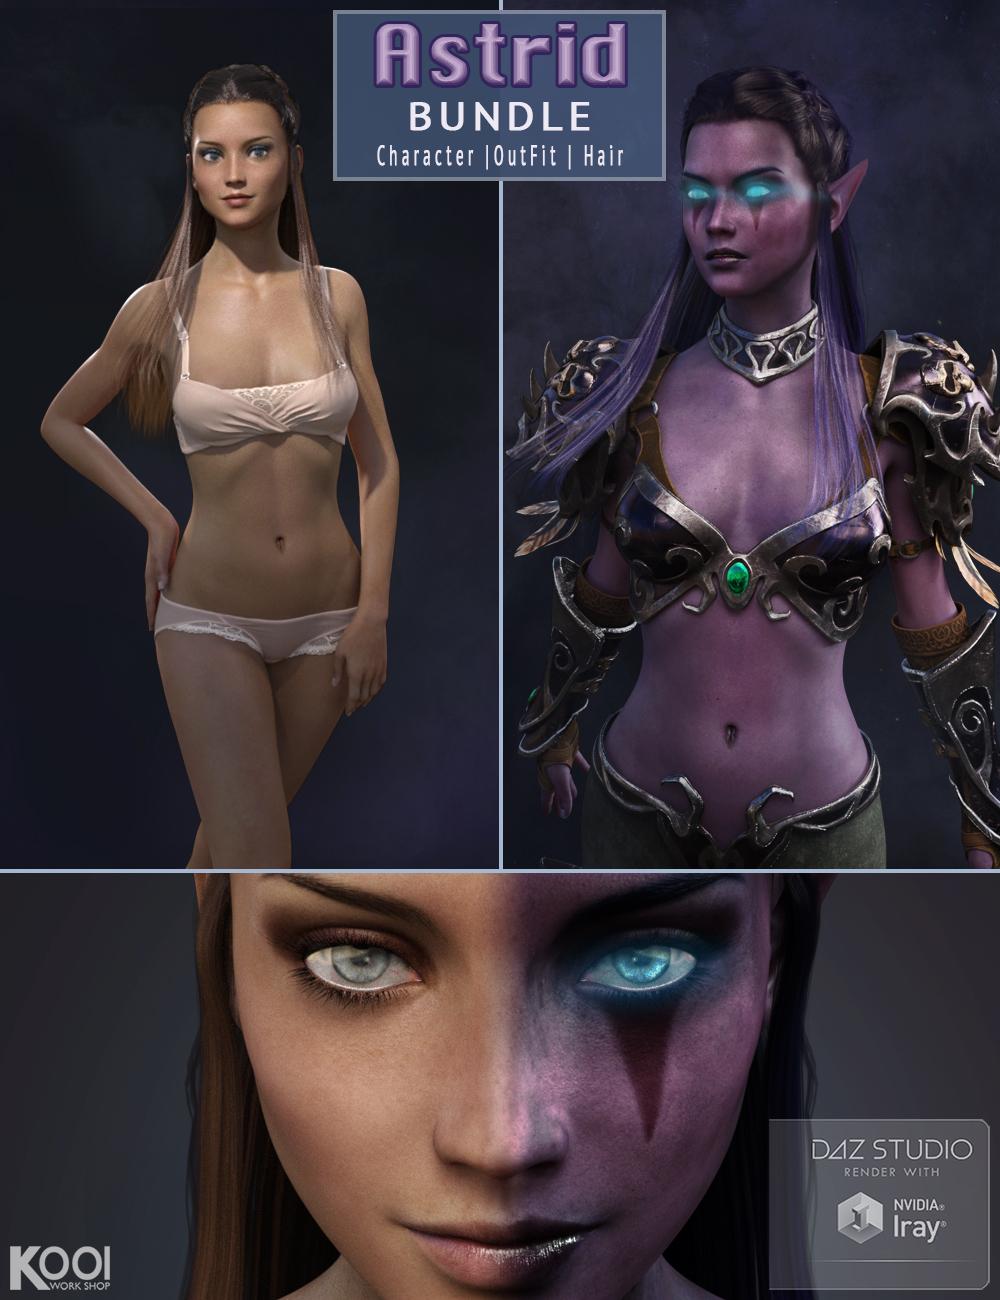 Astrid Elf Bundle by: Kool, 3D Models by Daz 3D